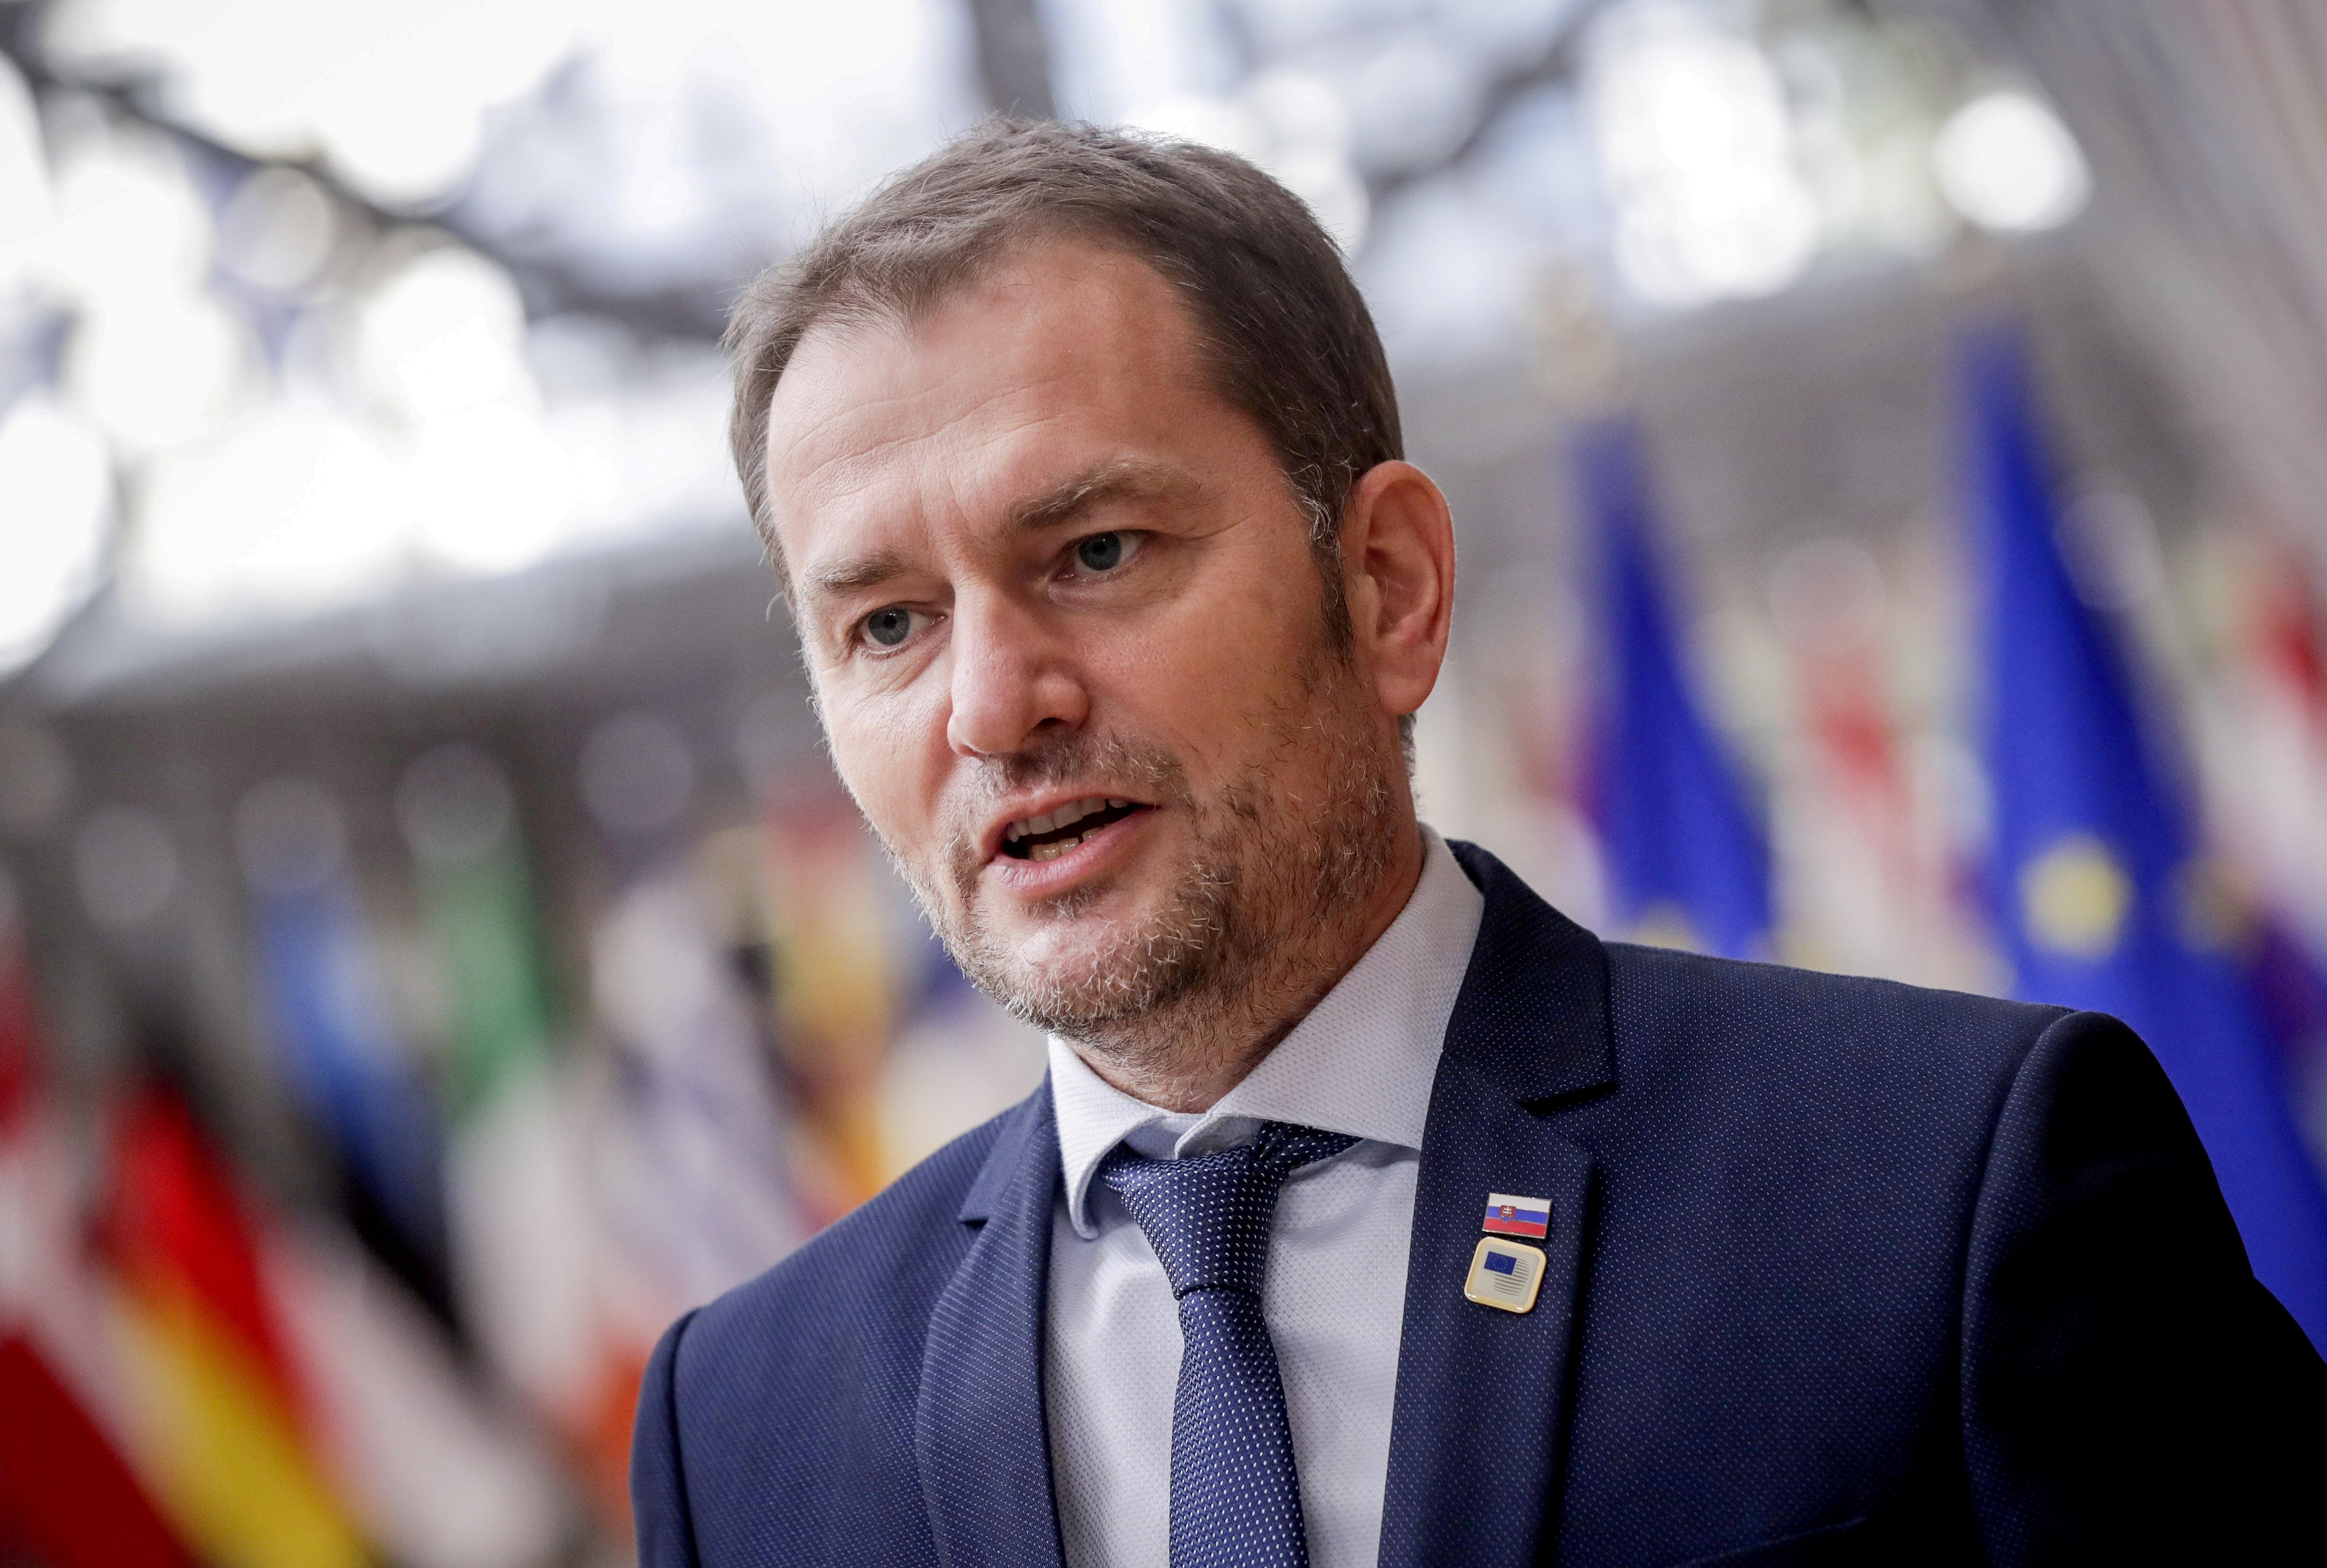 Slovak Prime Minister Igor Matovic arrives for an EU summit in Brussels, Belgium, October 15, 2020.  Olivier Hoslet/Pool via REUTERS